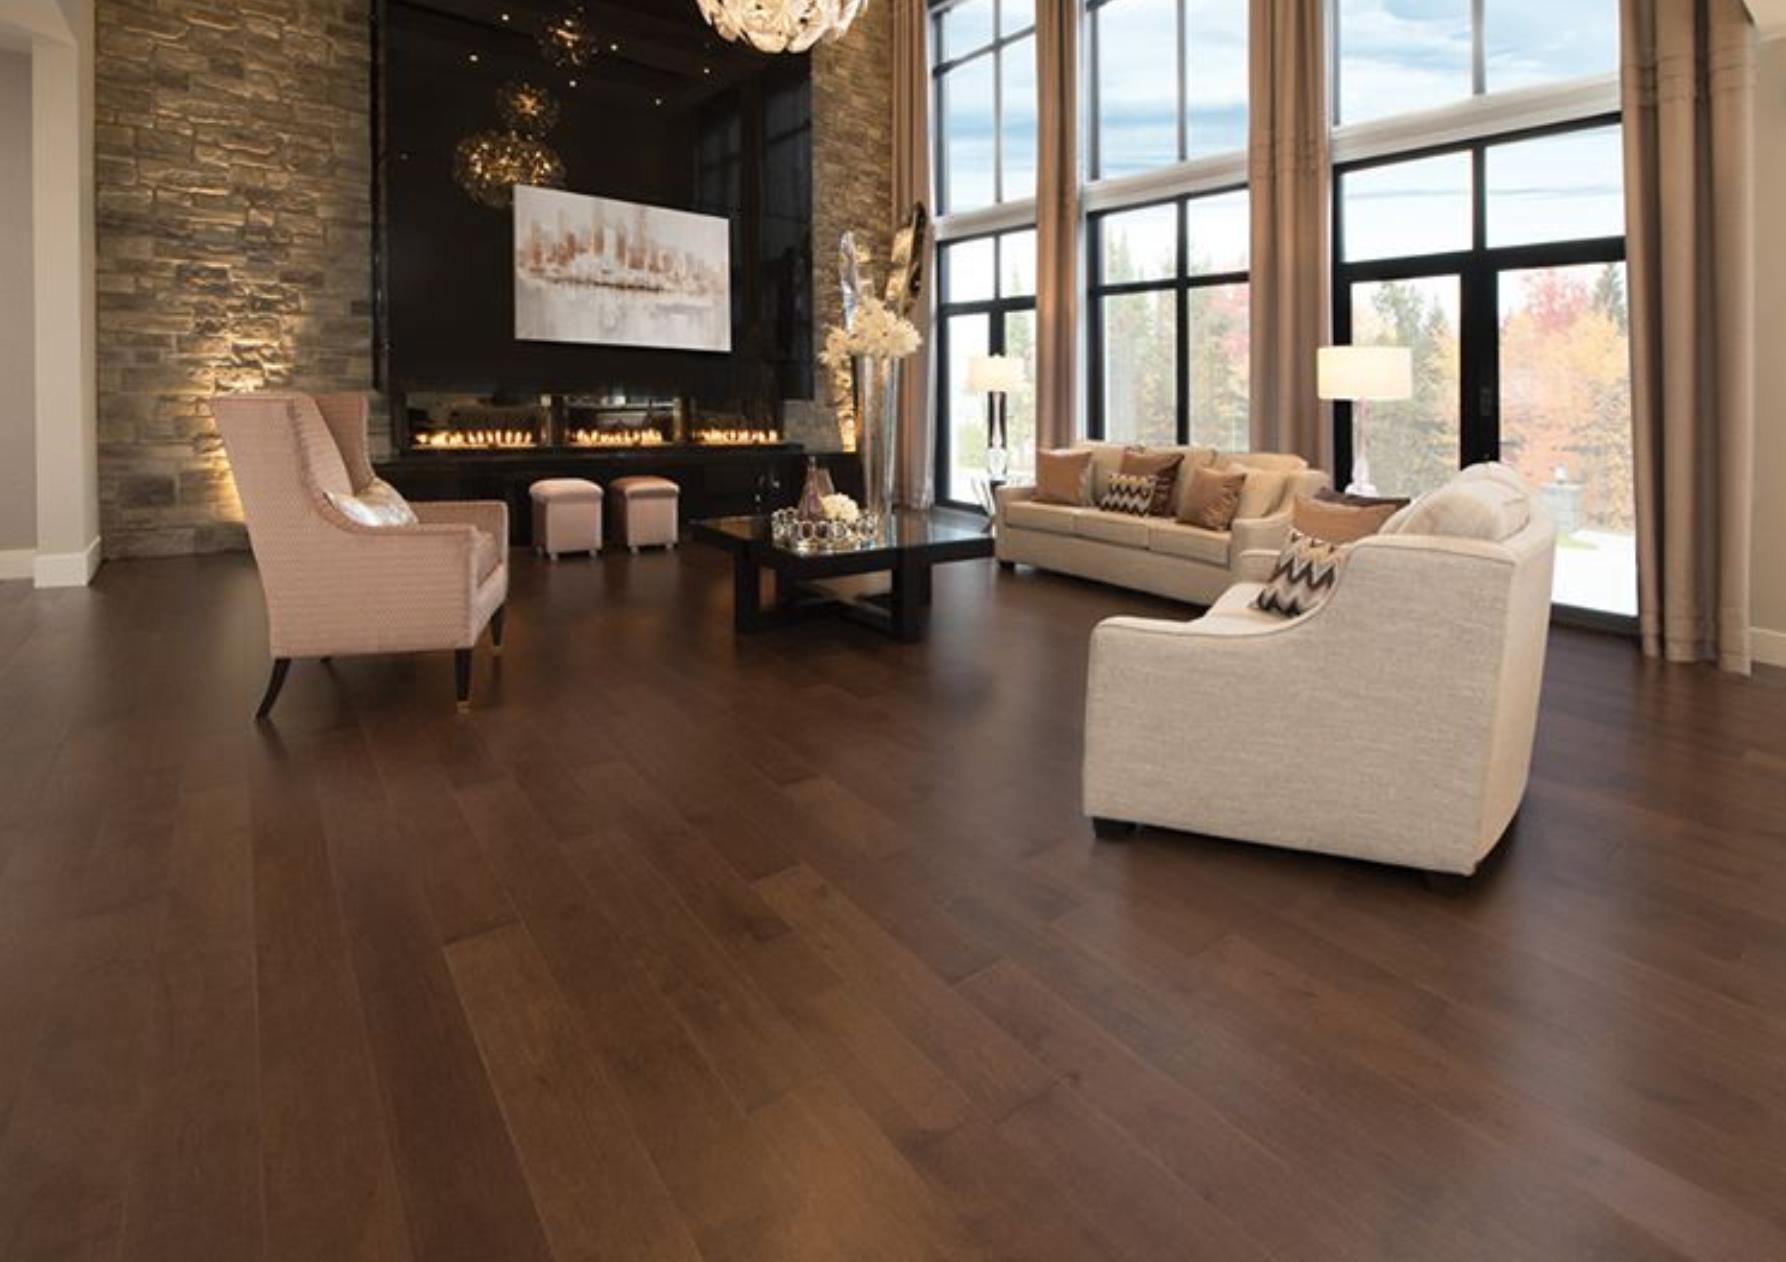 We Ve Got The High End Hardwood Flooring You Been Looking For Landers Premier In Austin Texas S Mirage